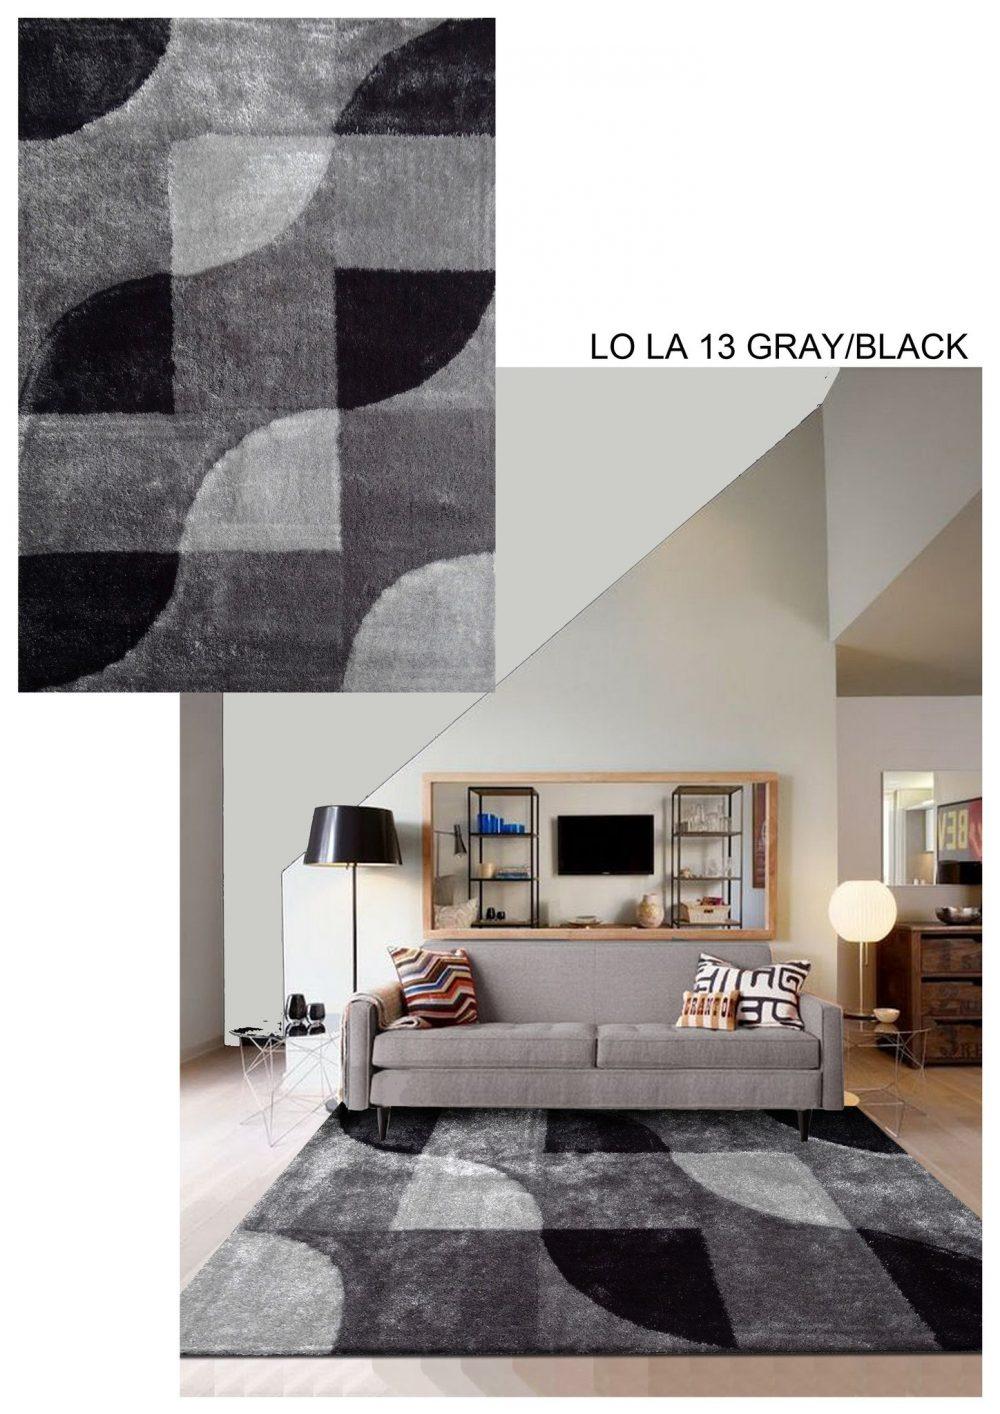 lola 13 grey black square area rug